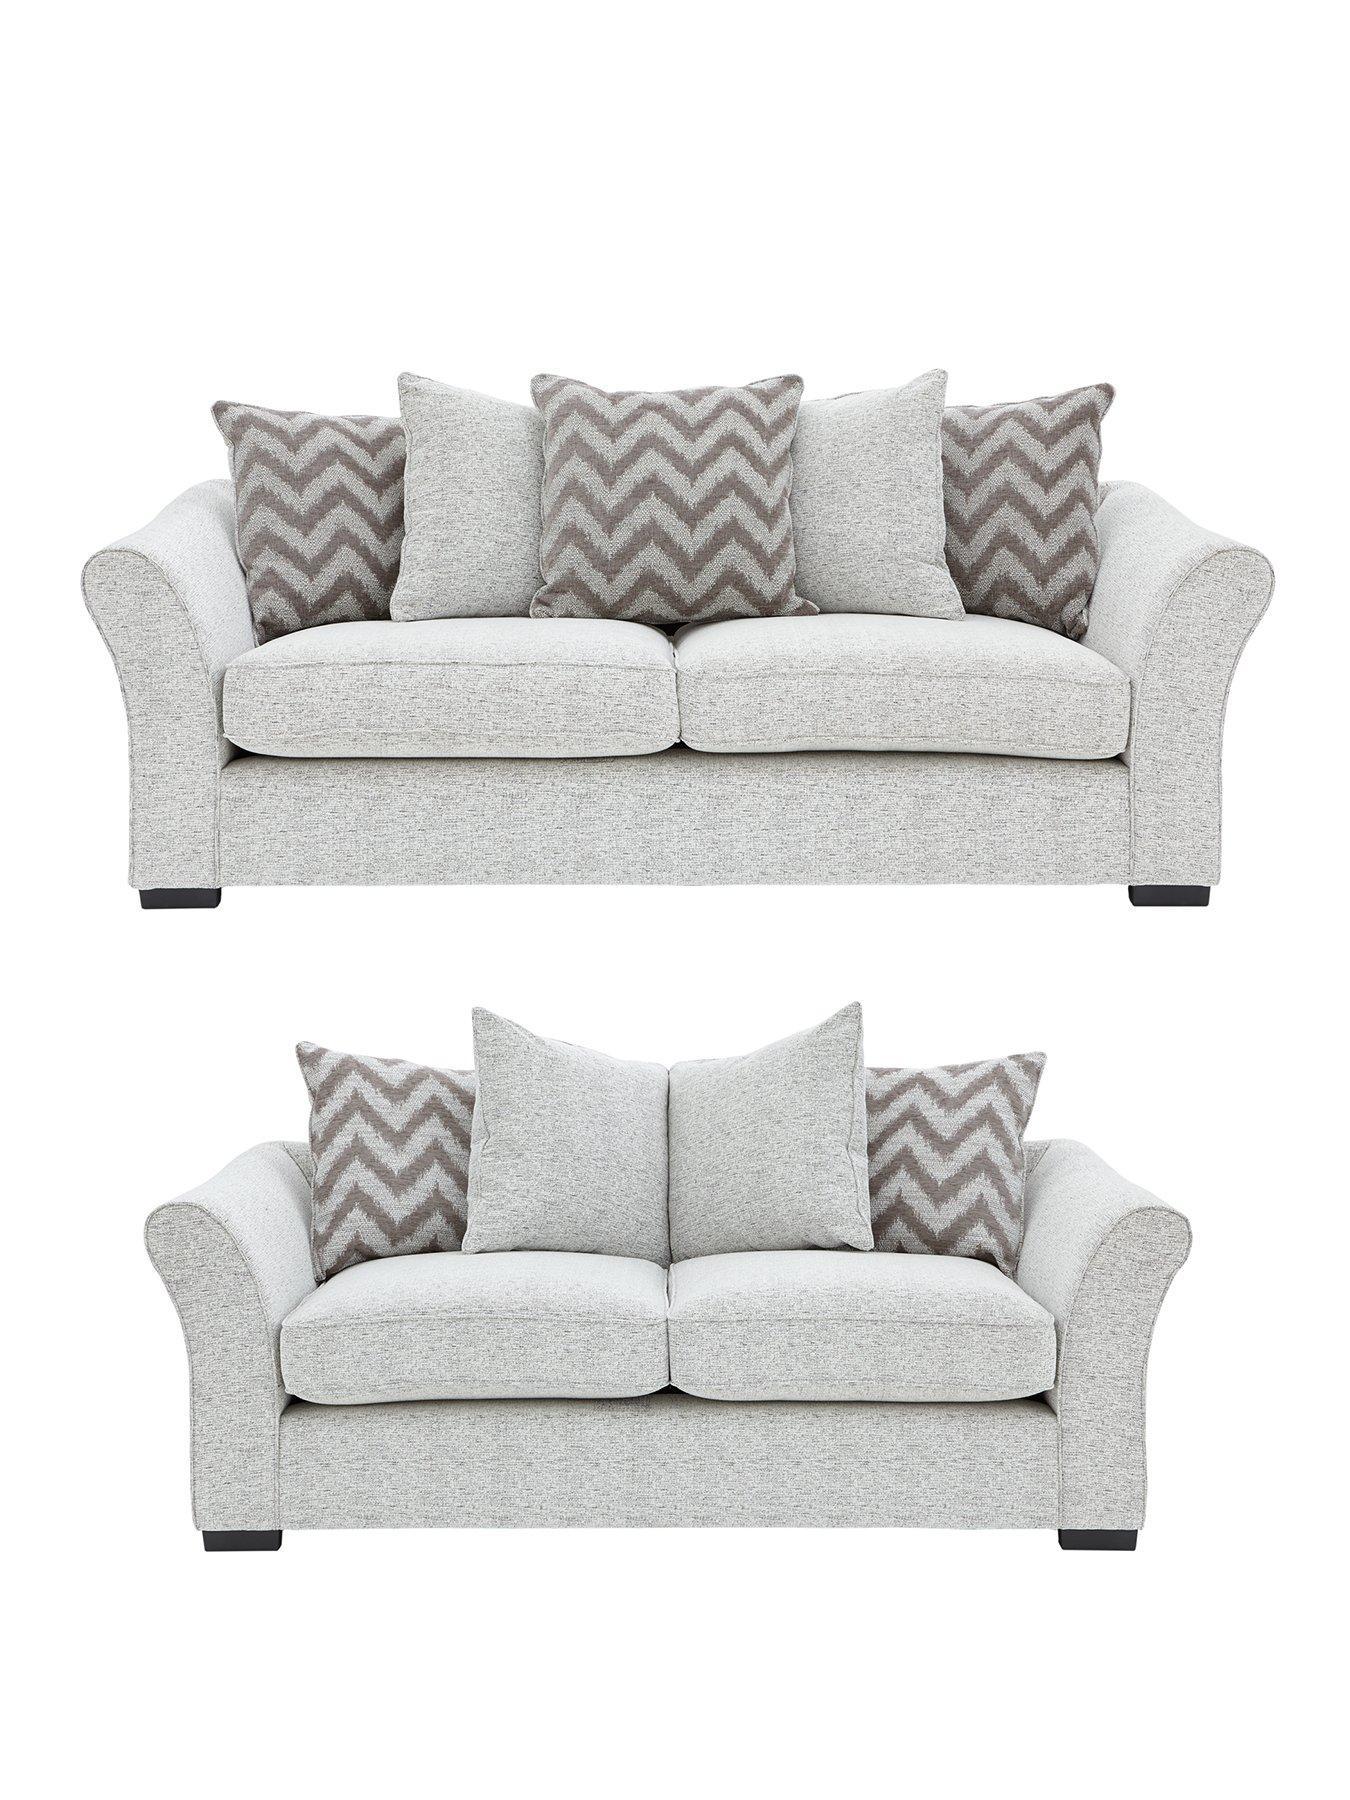 cavendish chevron 3seater 2seater fabric sofa set buy and save